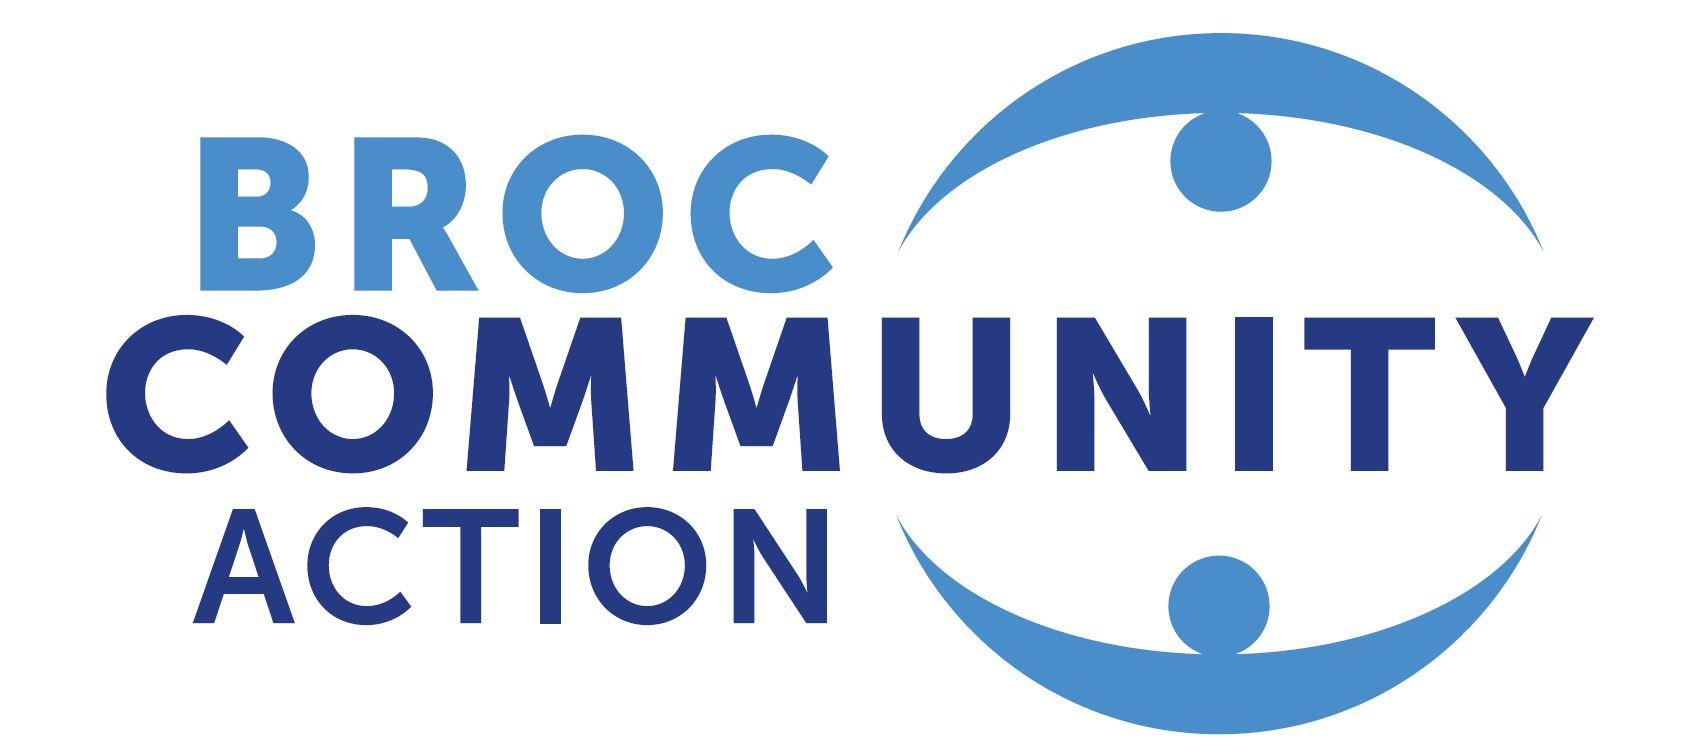 BROC Community Action logo